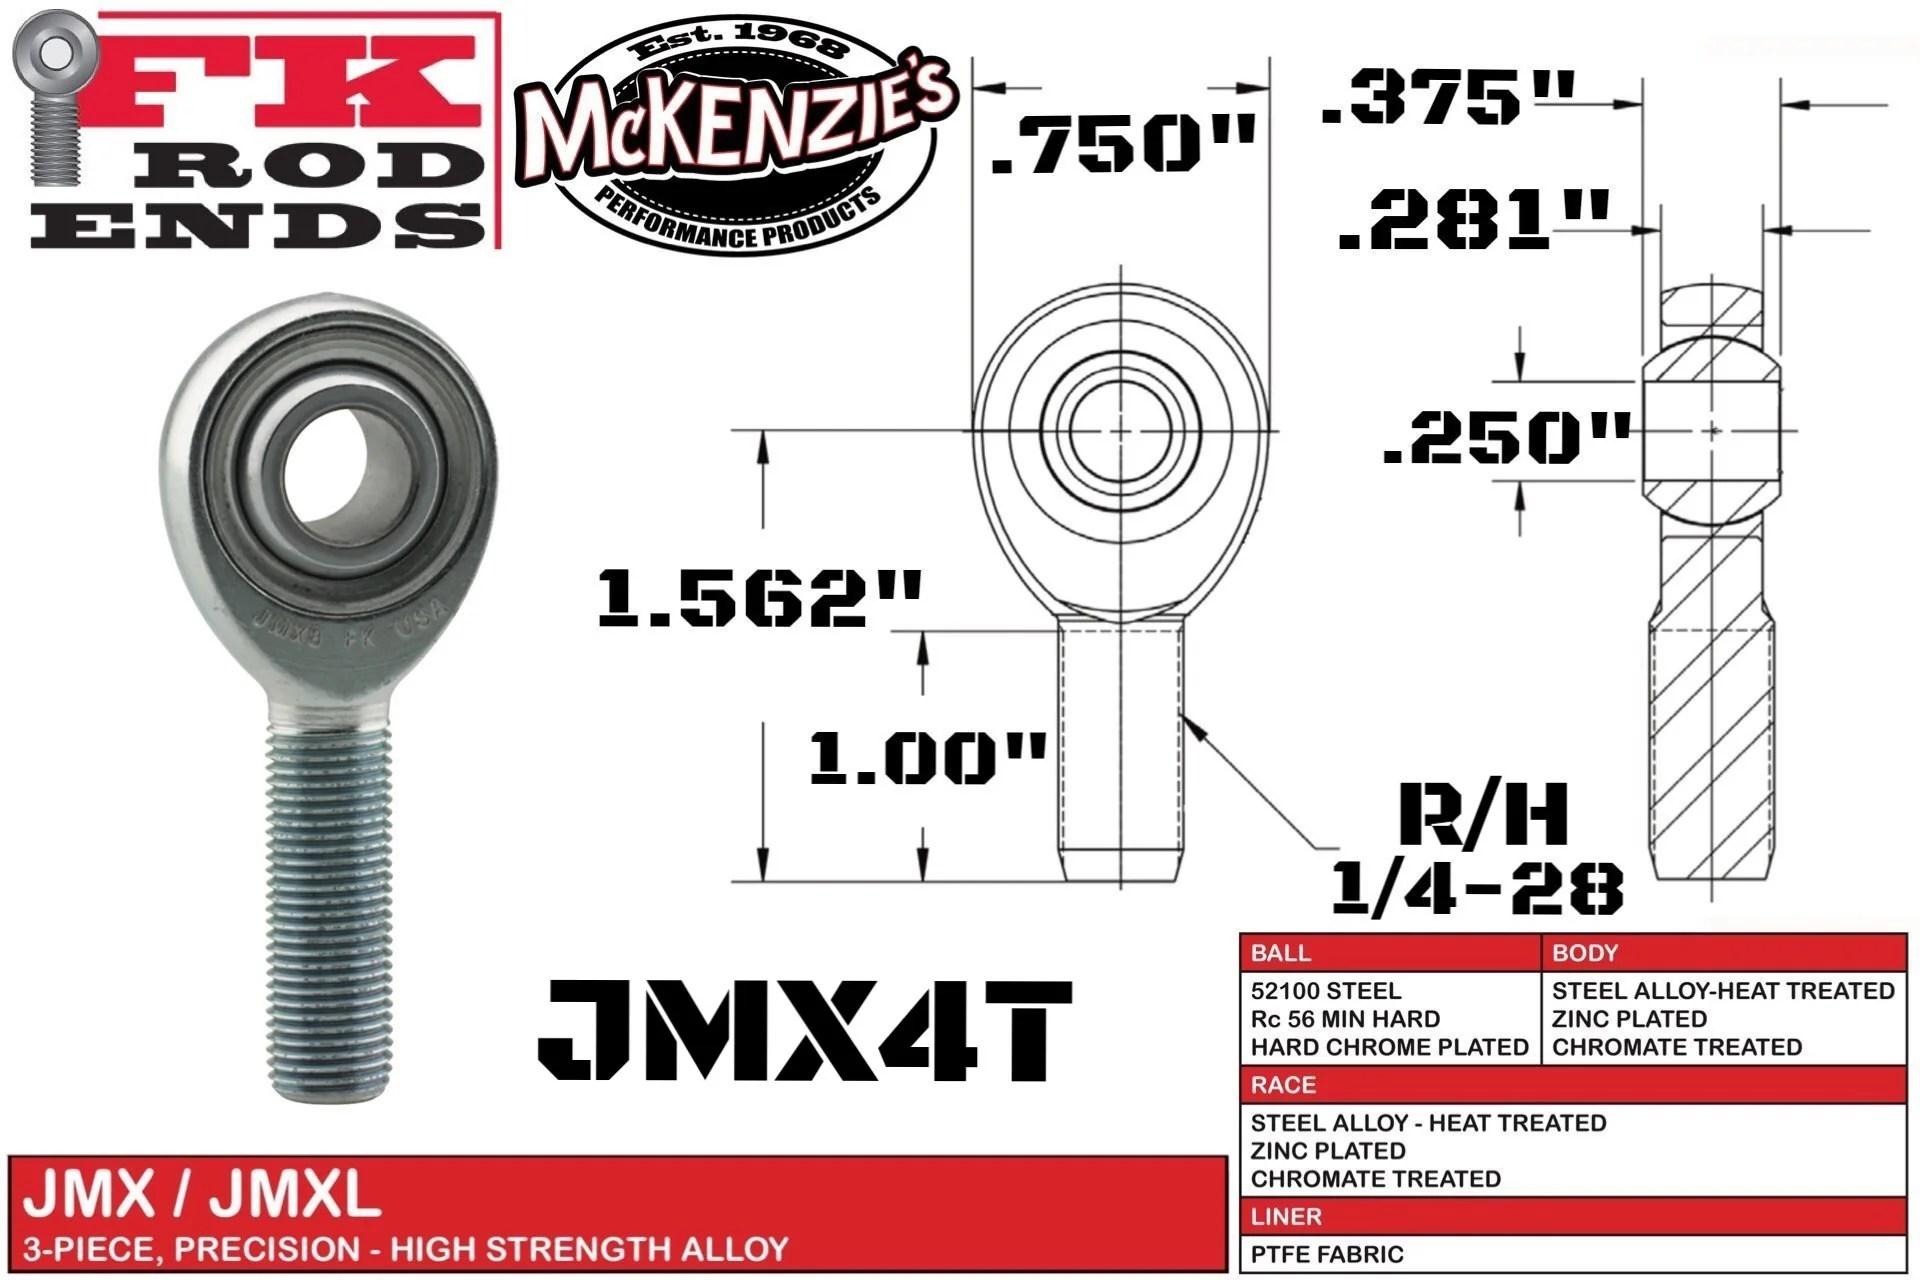 medium resolution of jmx4t male r h heim 1 4 28 thread 250 ball fk bearing